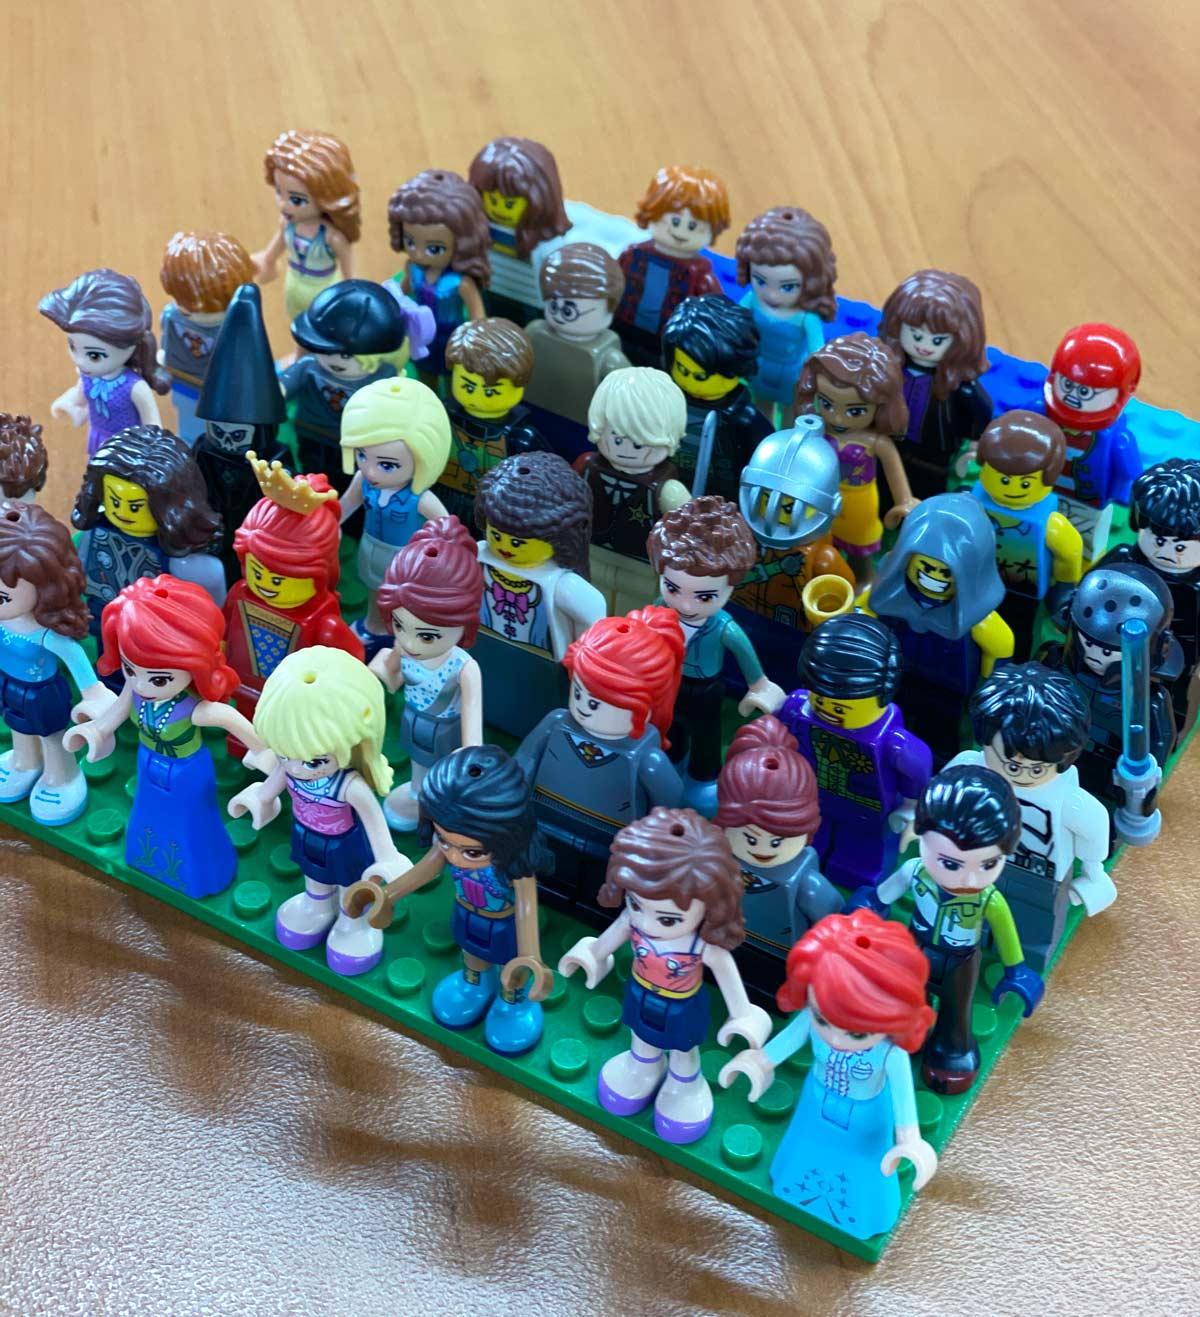 Tallulah O'Hara used Lego to create various historical figures